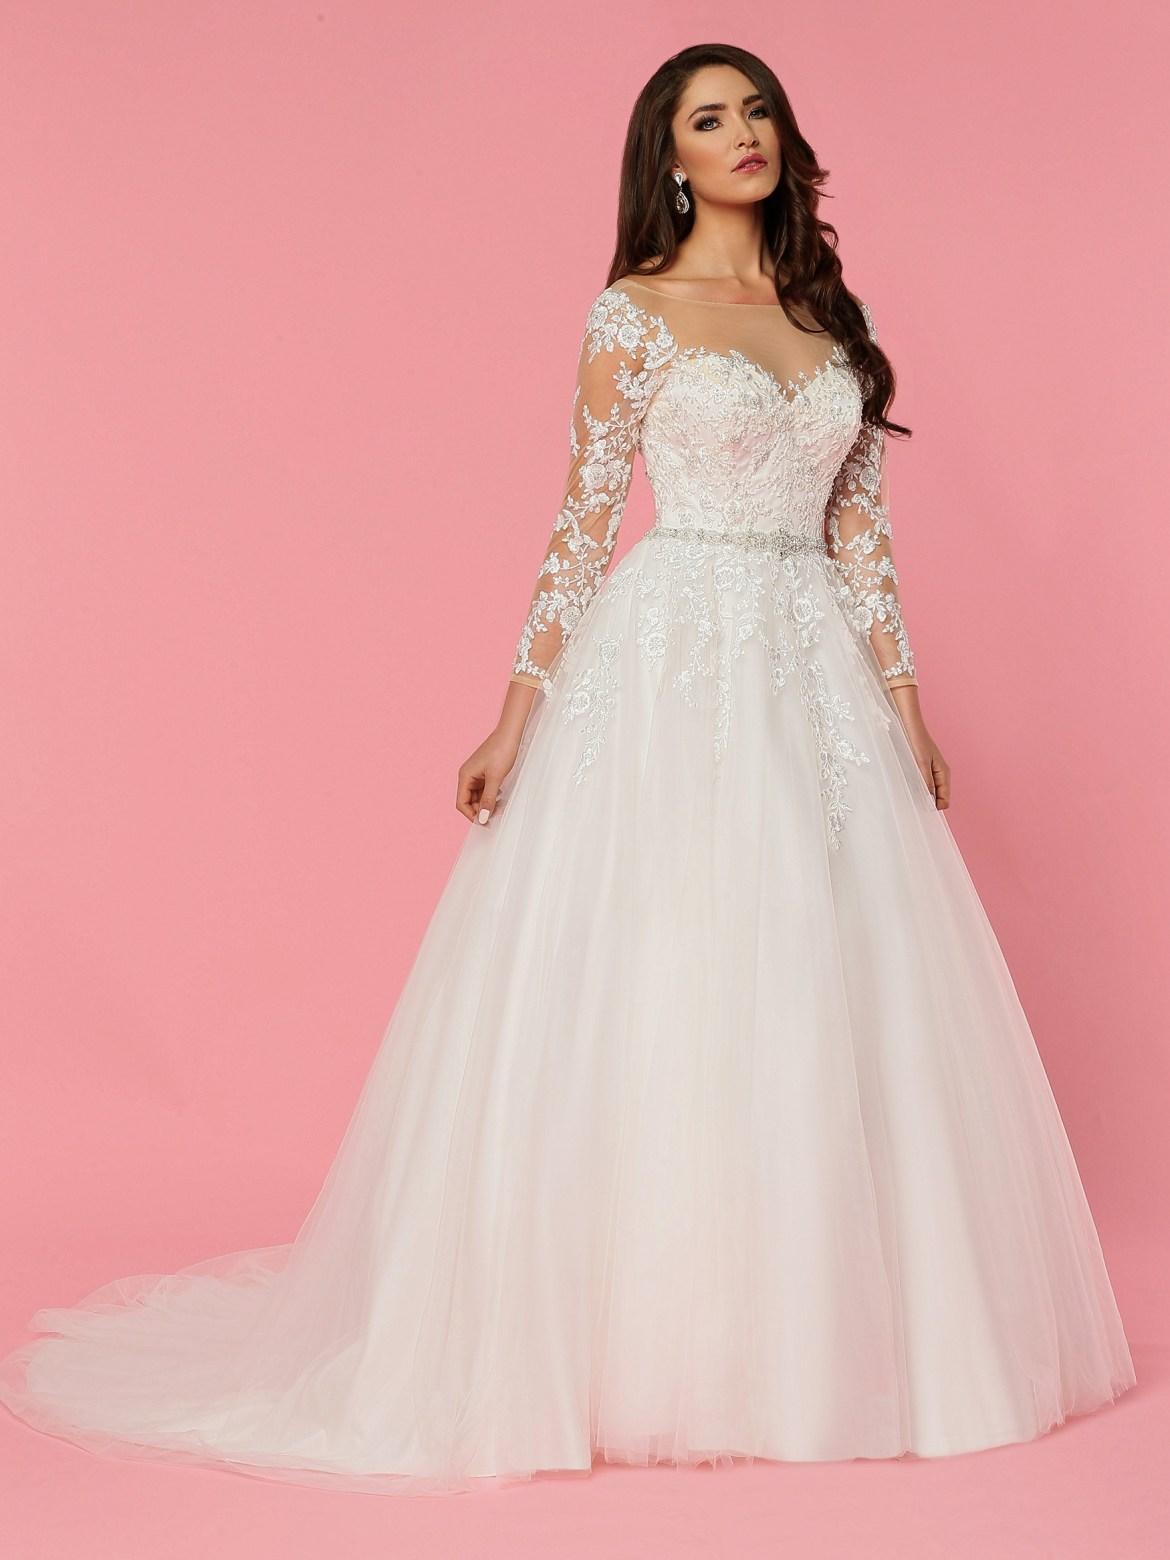 Stunning Wedding Dresses with Sleeves & Jackets - DaVinci Bridal Blog